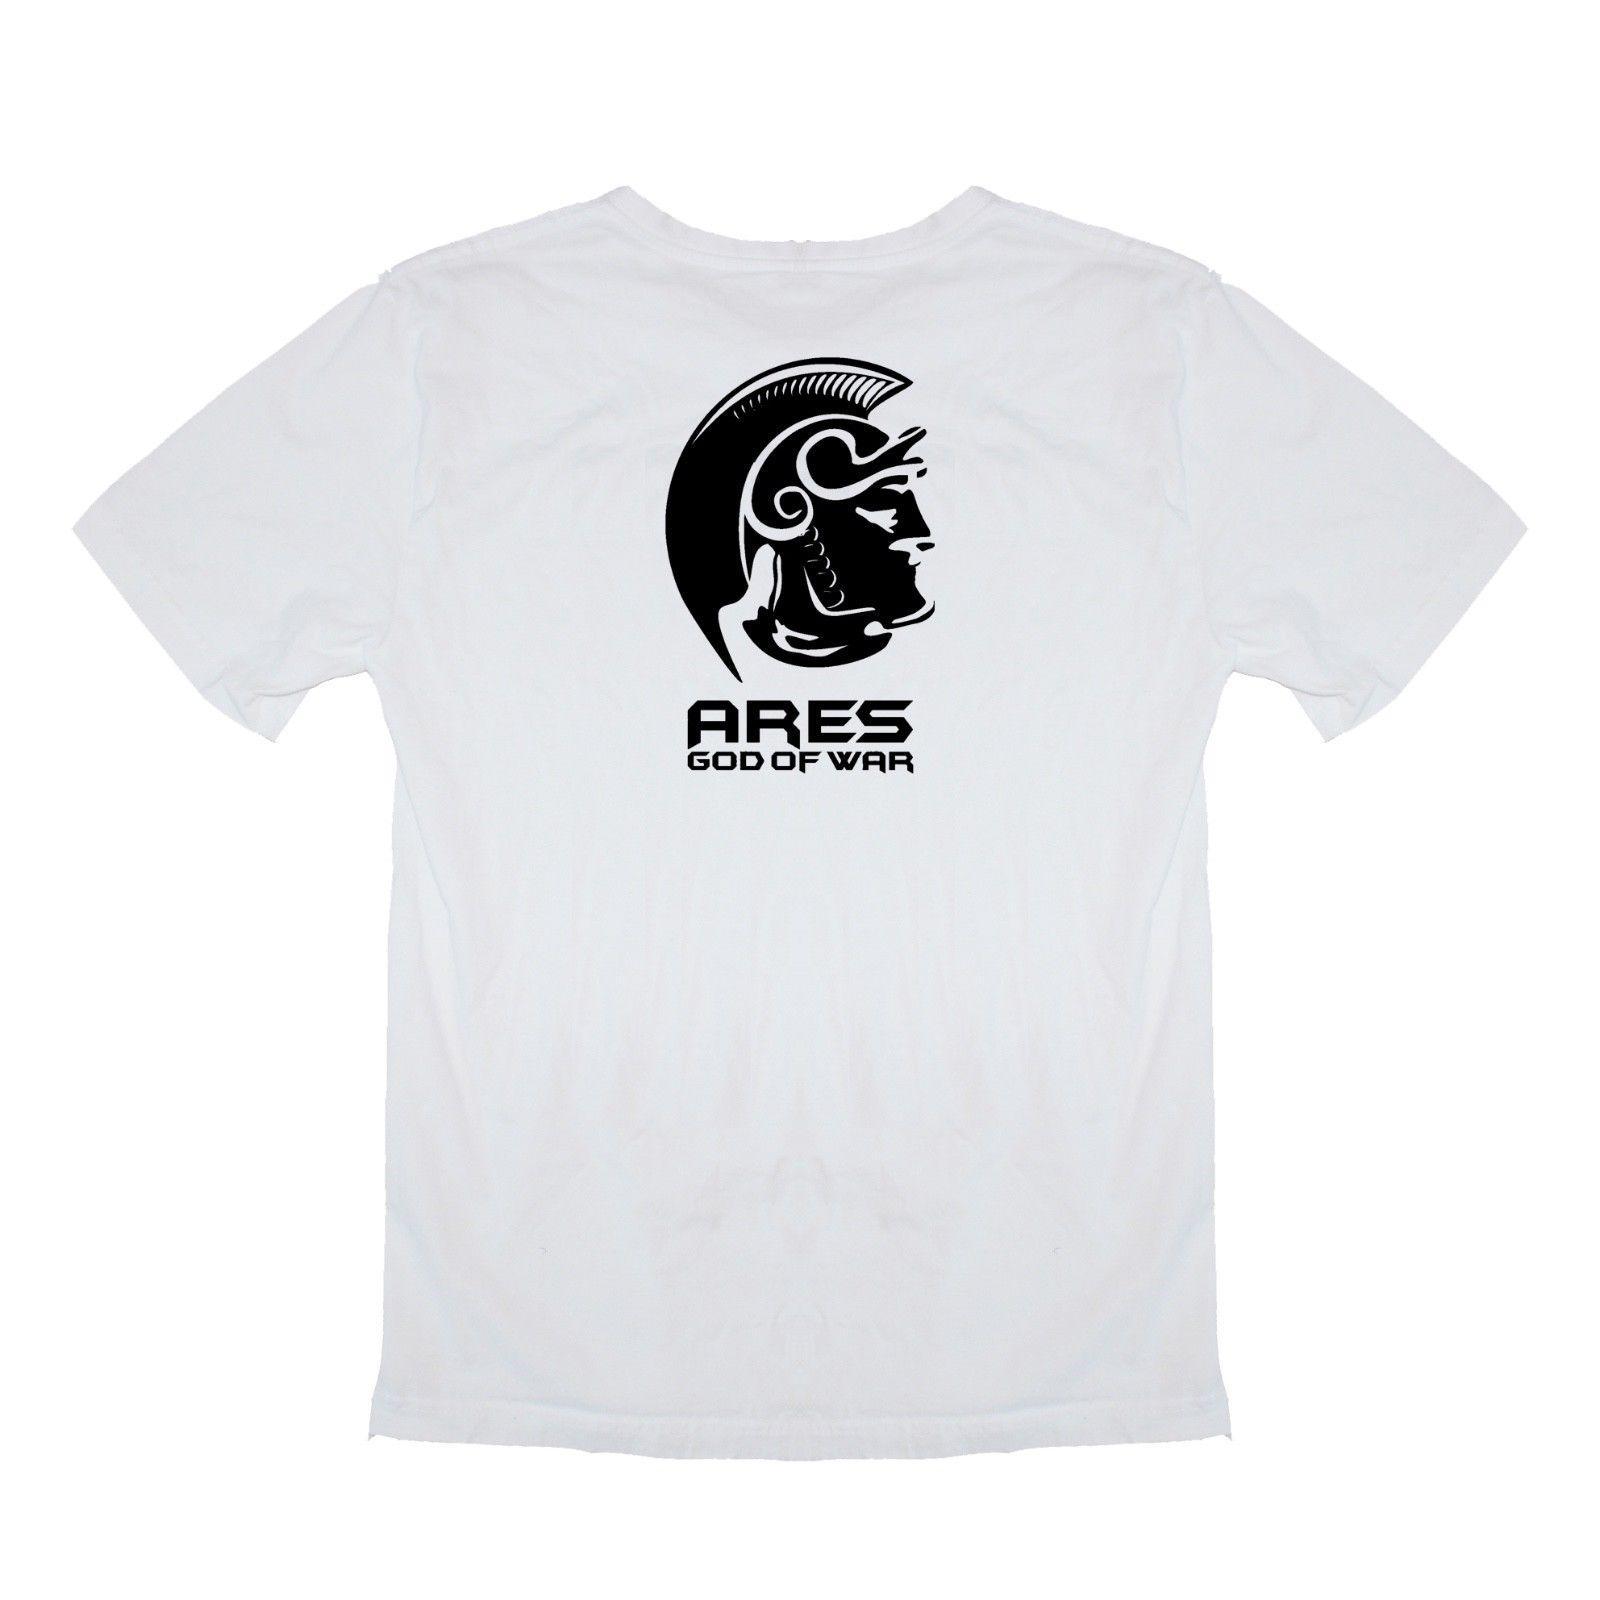 Ares God Of Warolympian Deity Sea Greek Mythology Shirt Size S Xxxl